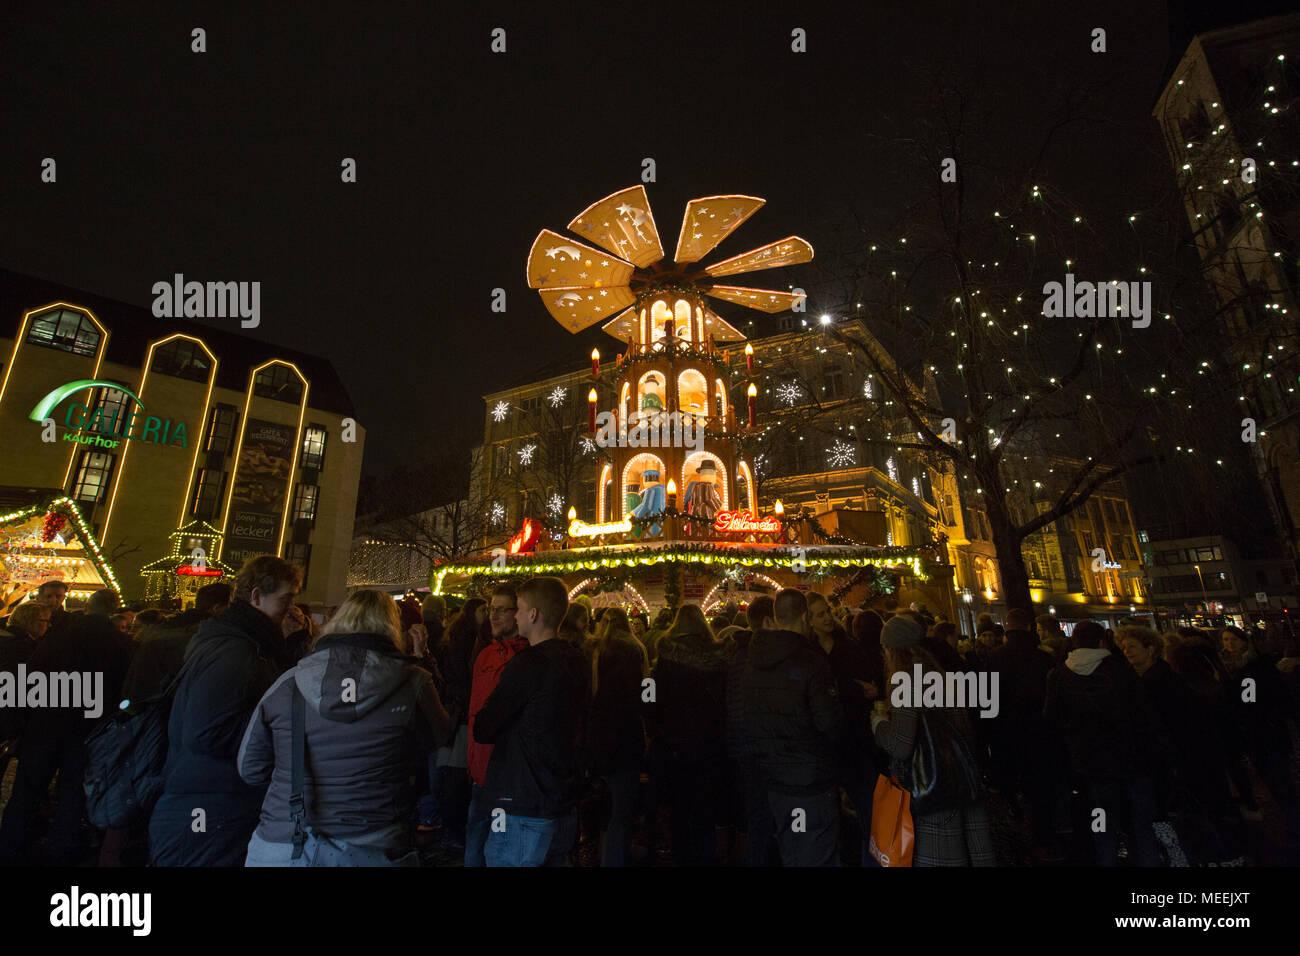 Traditional Christmas Market or Weihnachtsmarkt at Bonn, North Rhine Westphalia, Germany. - Stock Image